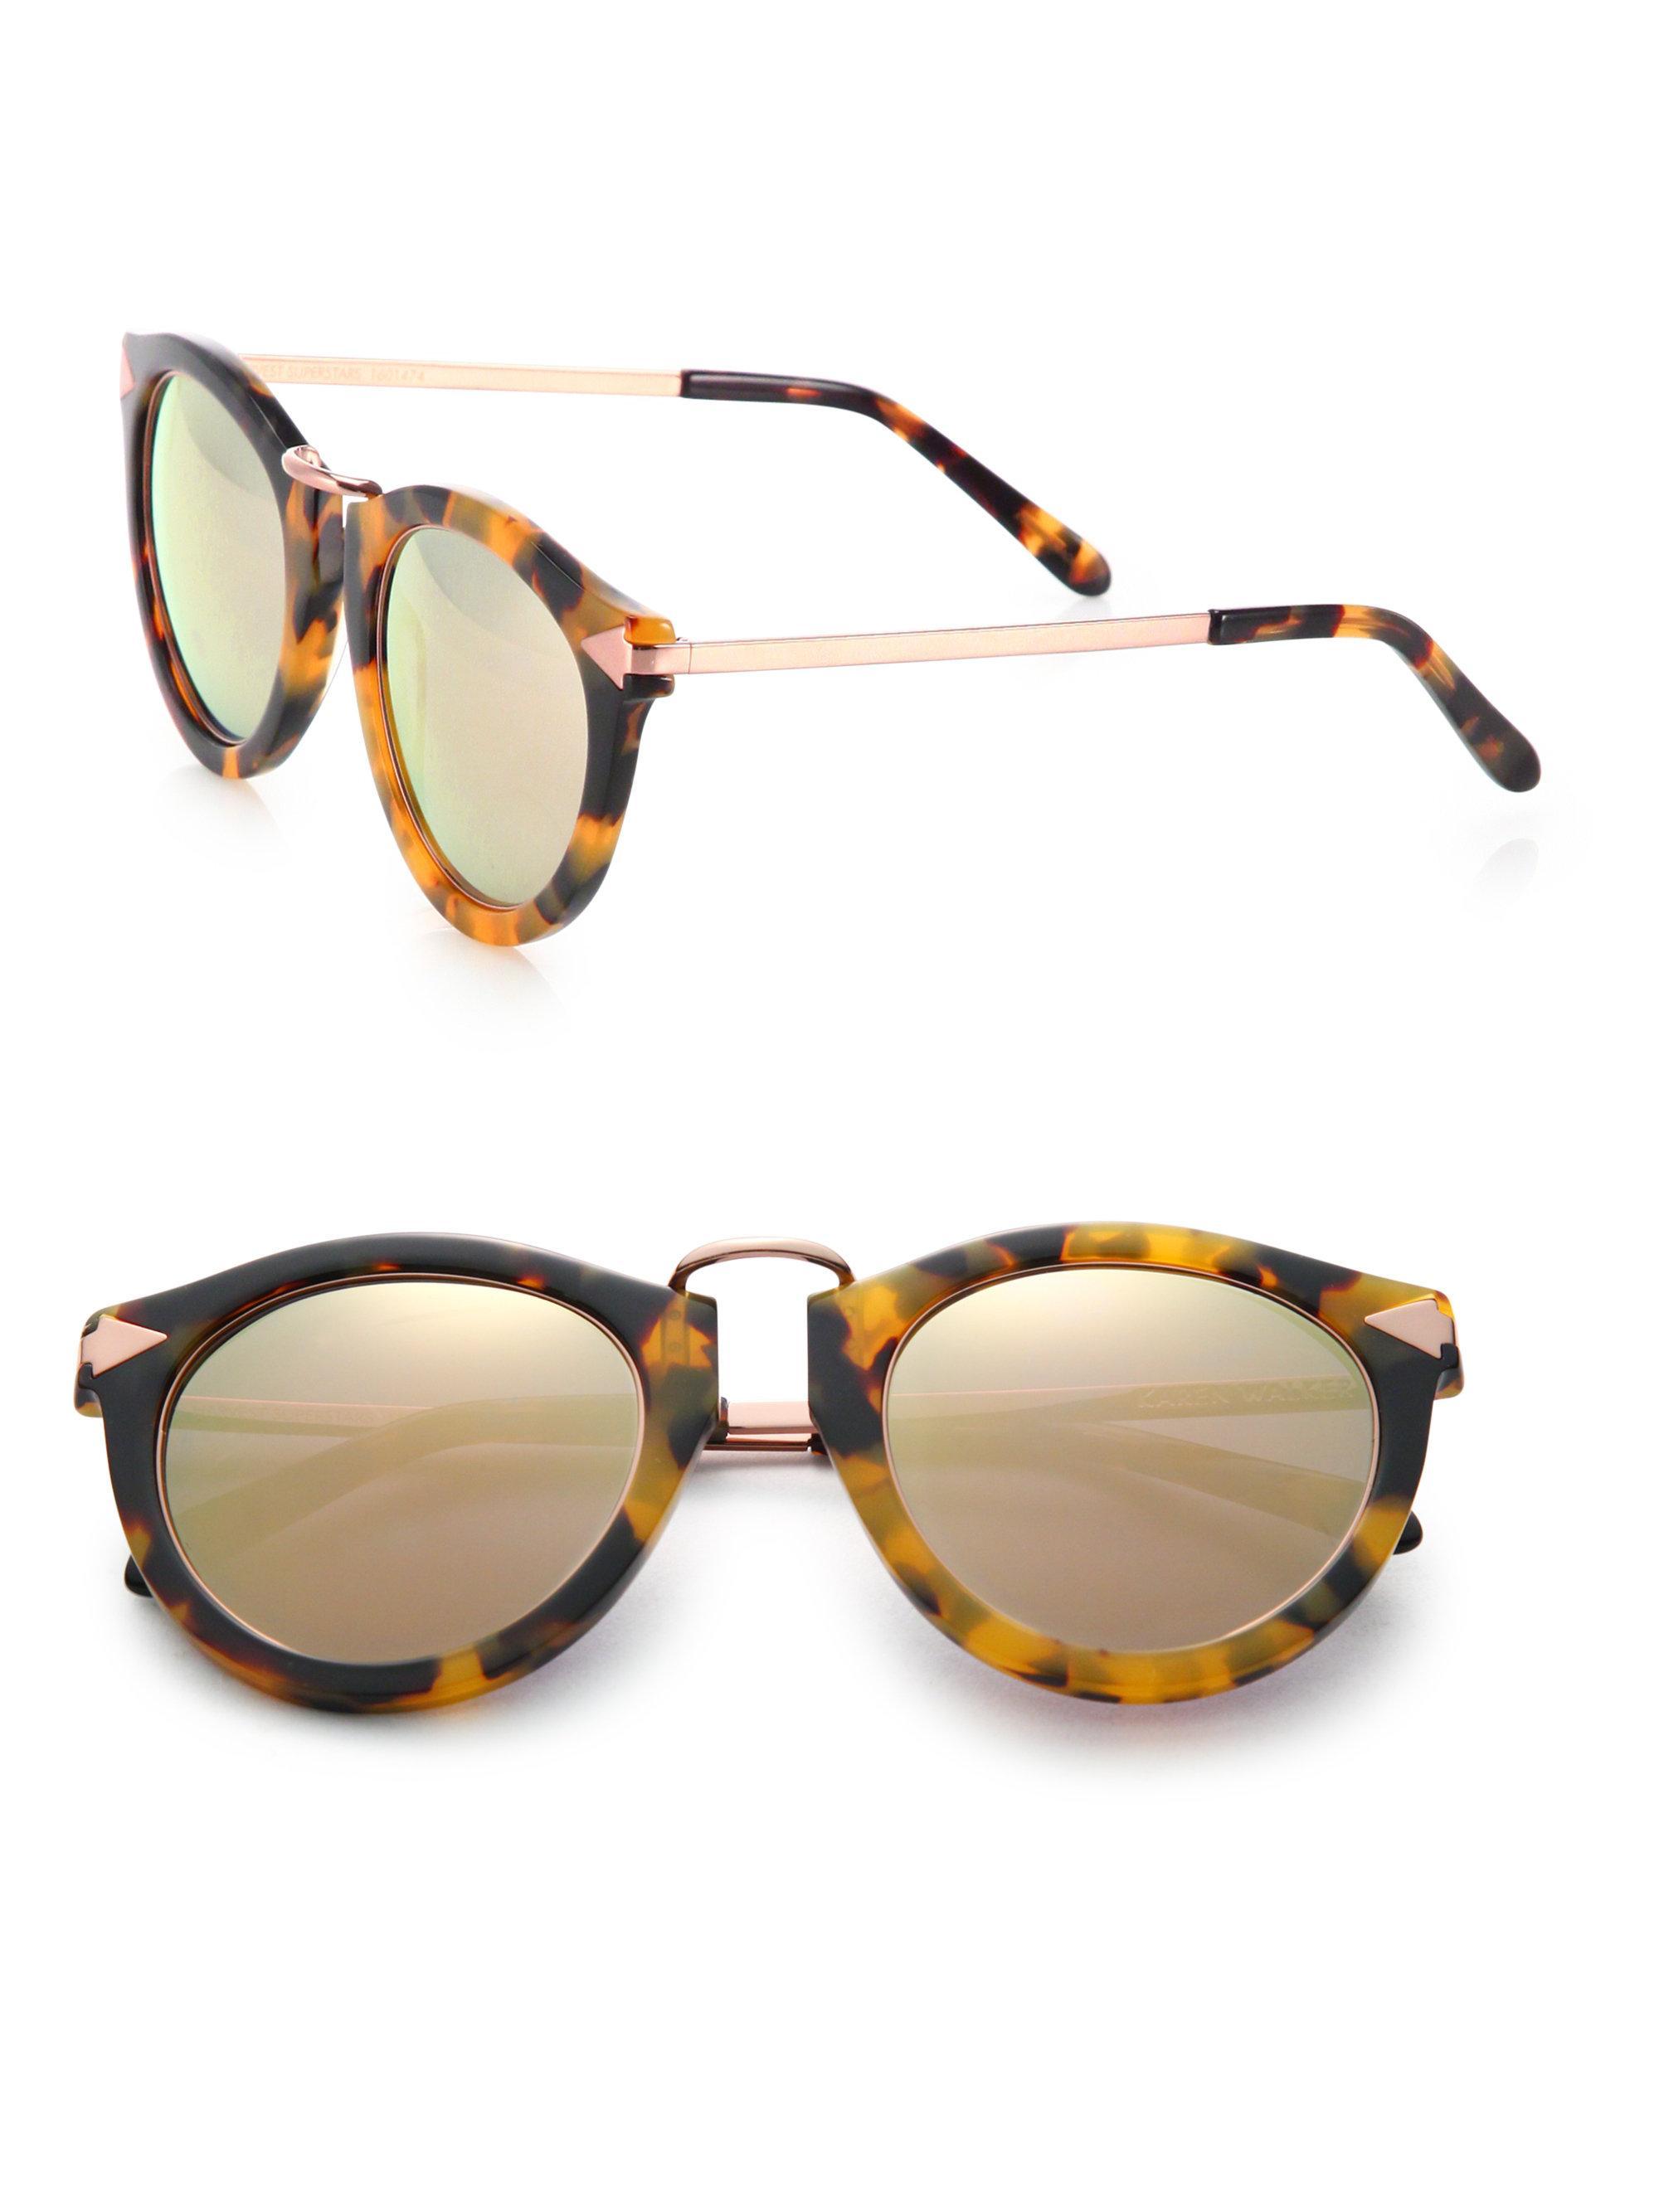 6448b0bbf532 Karen Walker. Women s Superstars Harvest Mirrored Round Sunglasses